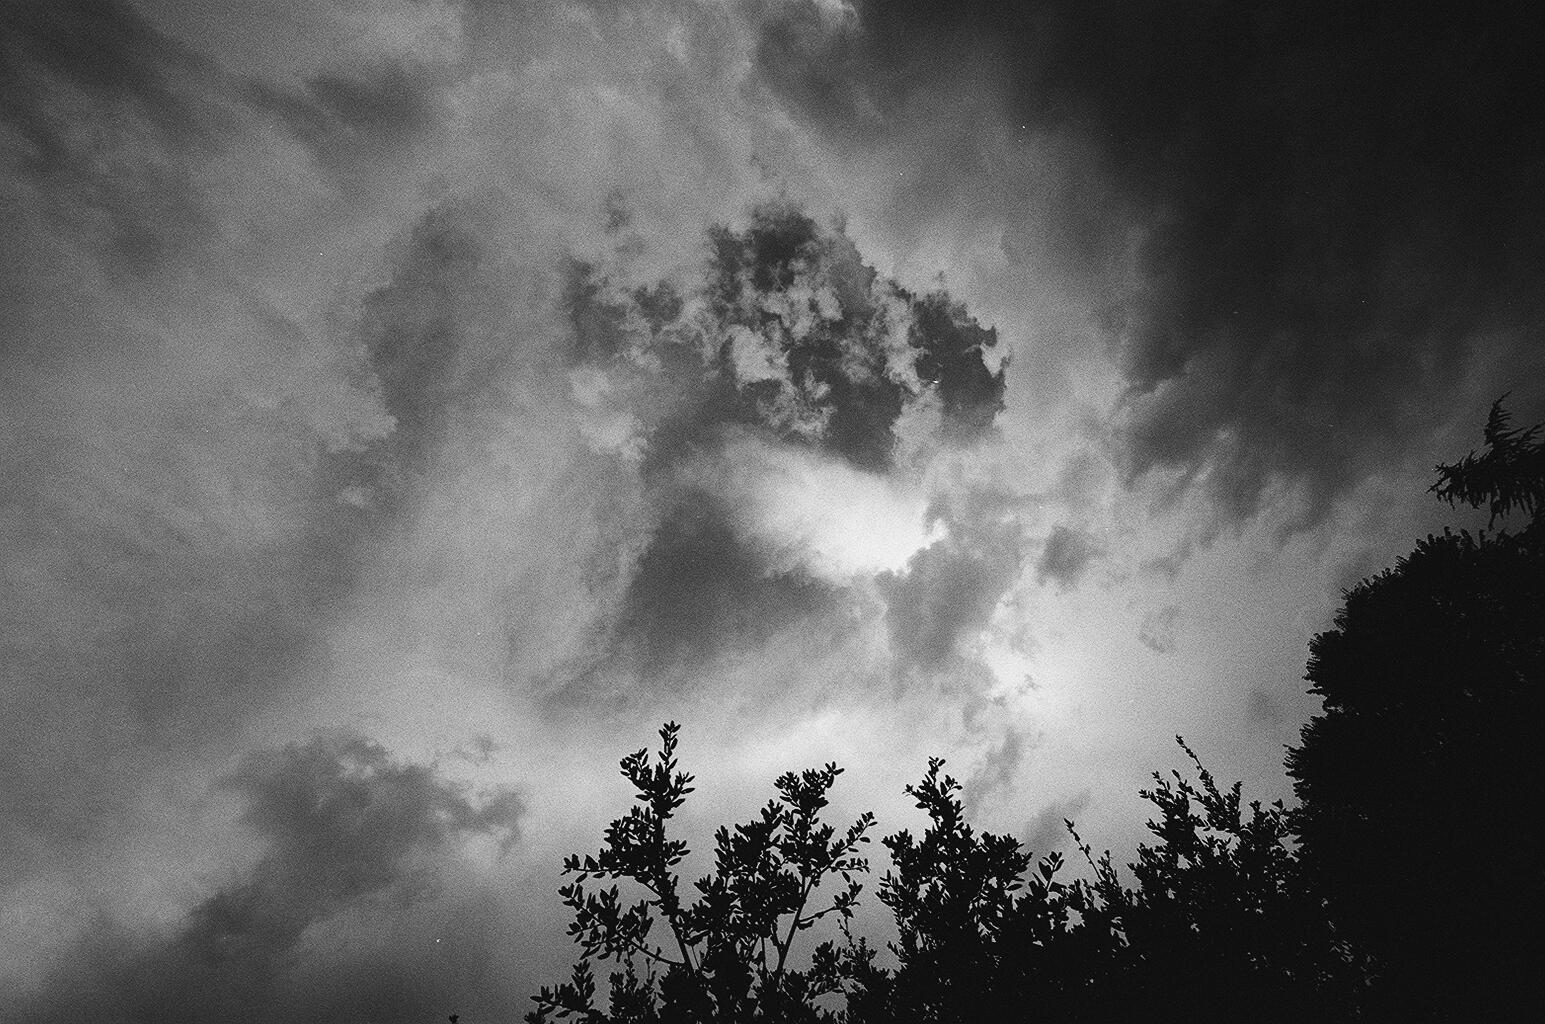 Taken on HP5 by Karl Christofferson